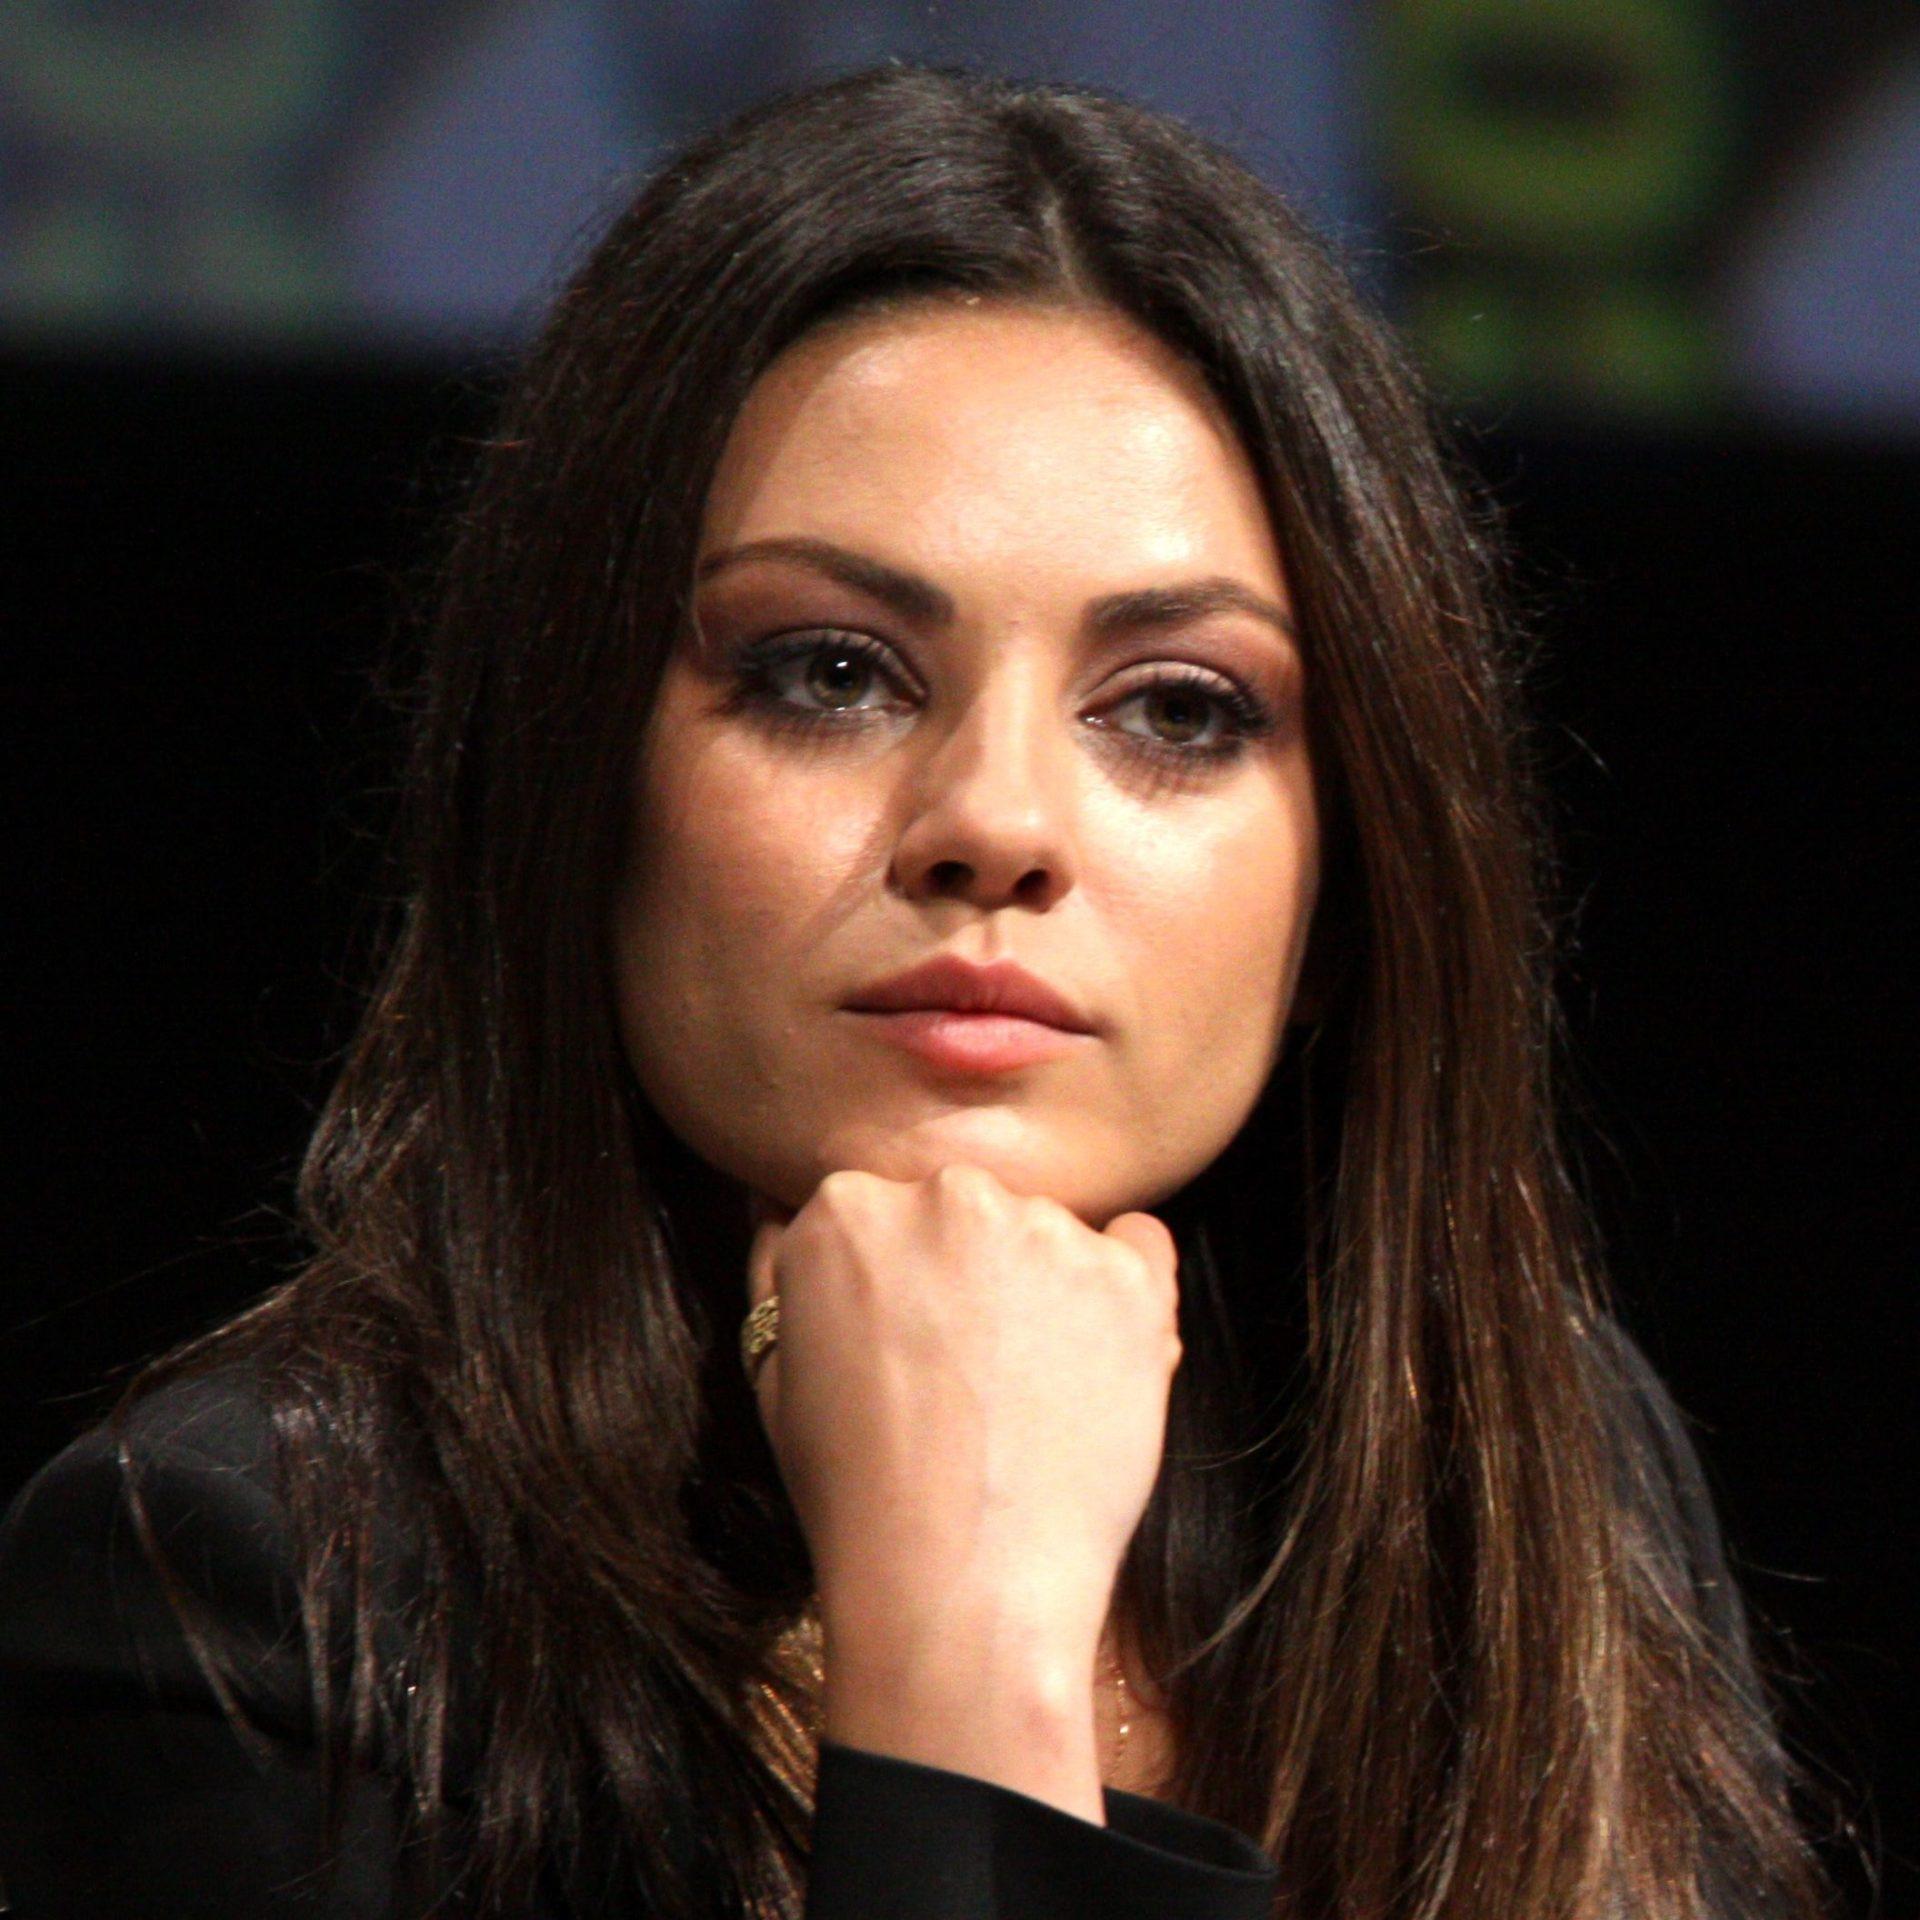 Mila Kunis choosing color for olive skin lifestylemajor edited 1